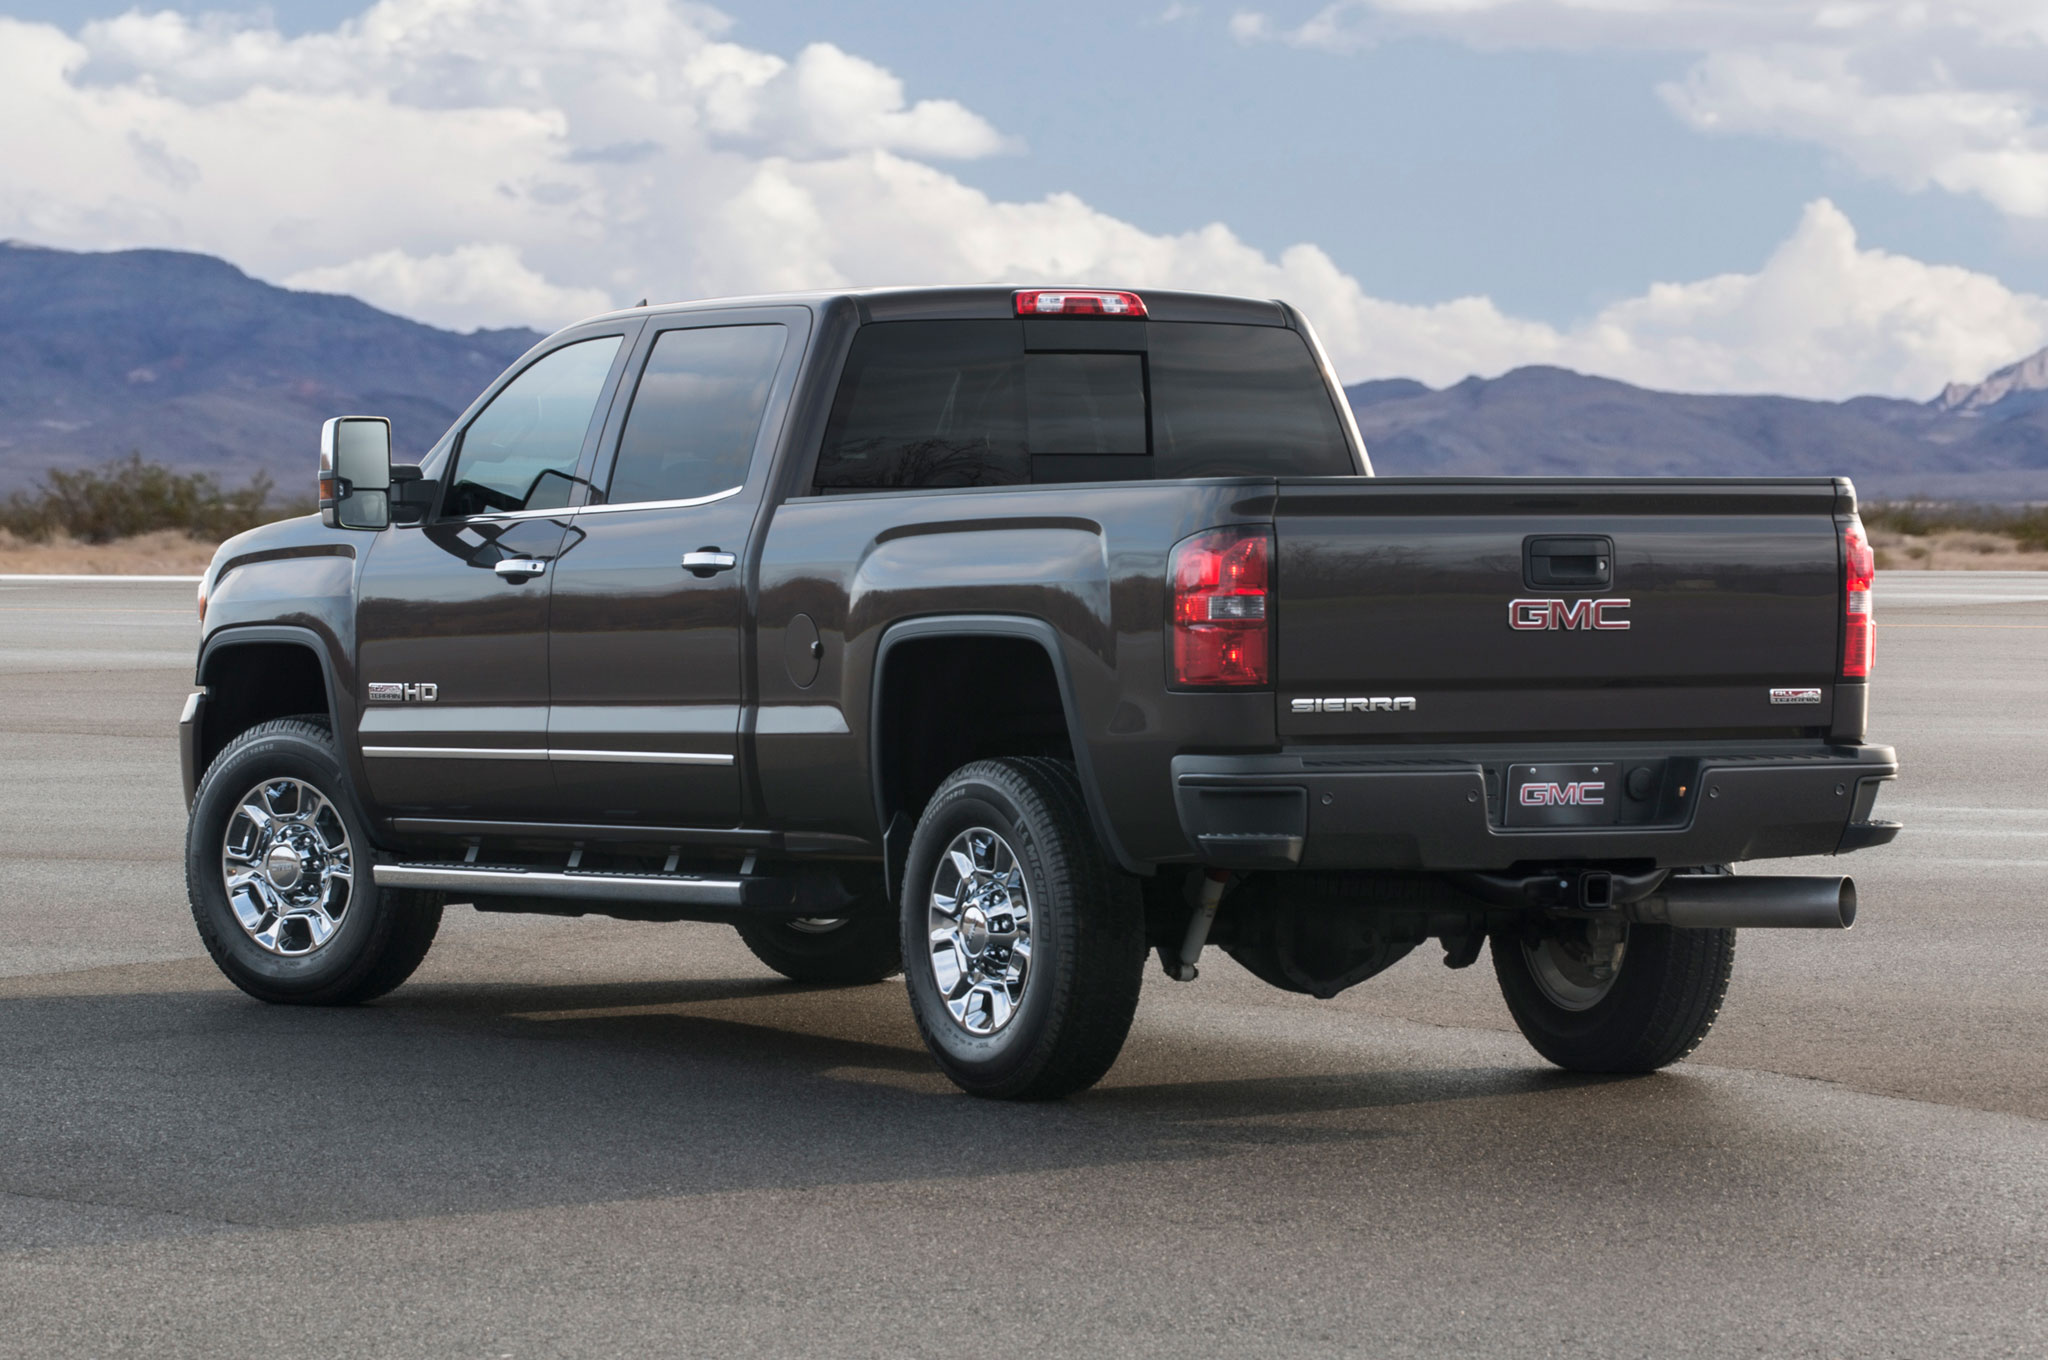 gmc earn test news ratings yukon crash road tahoe chevrolet video h top truck